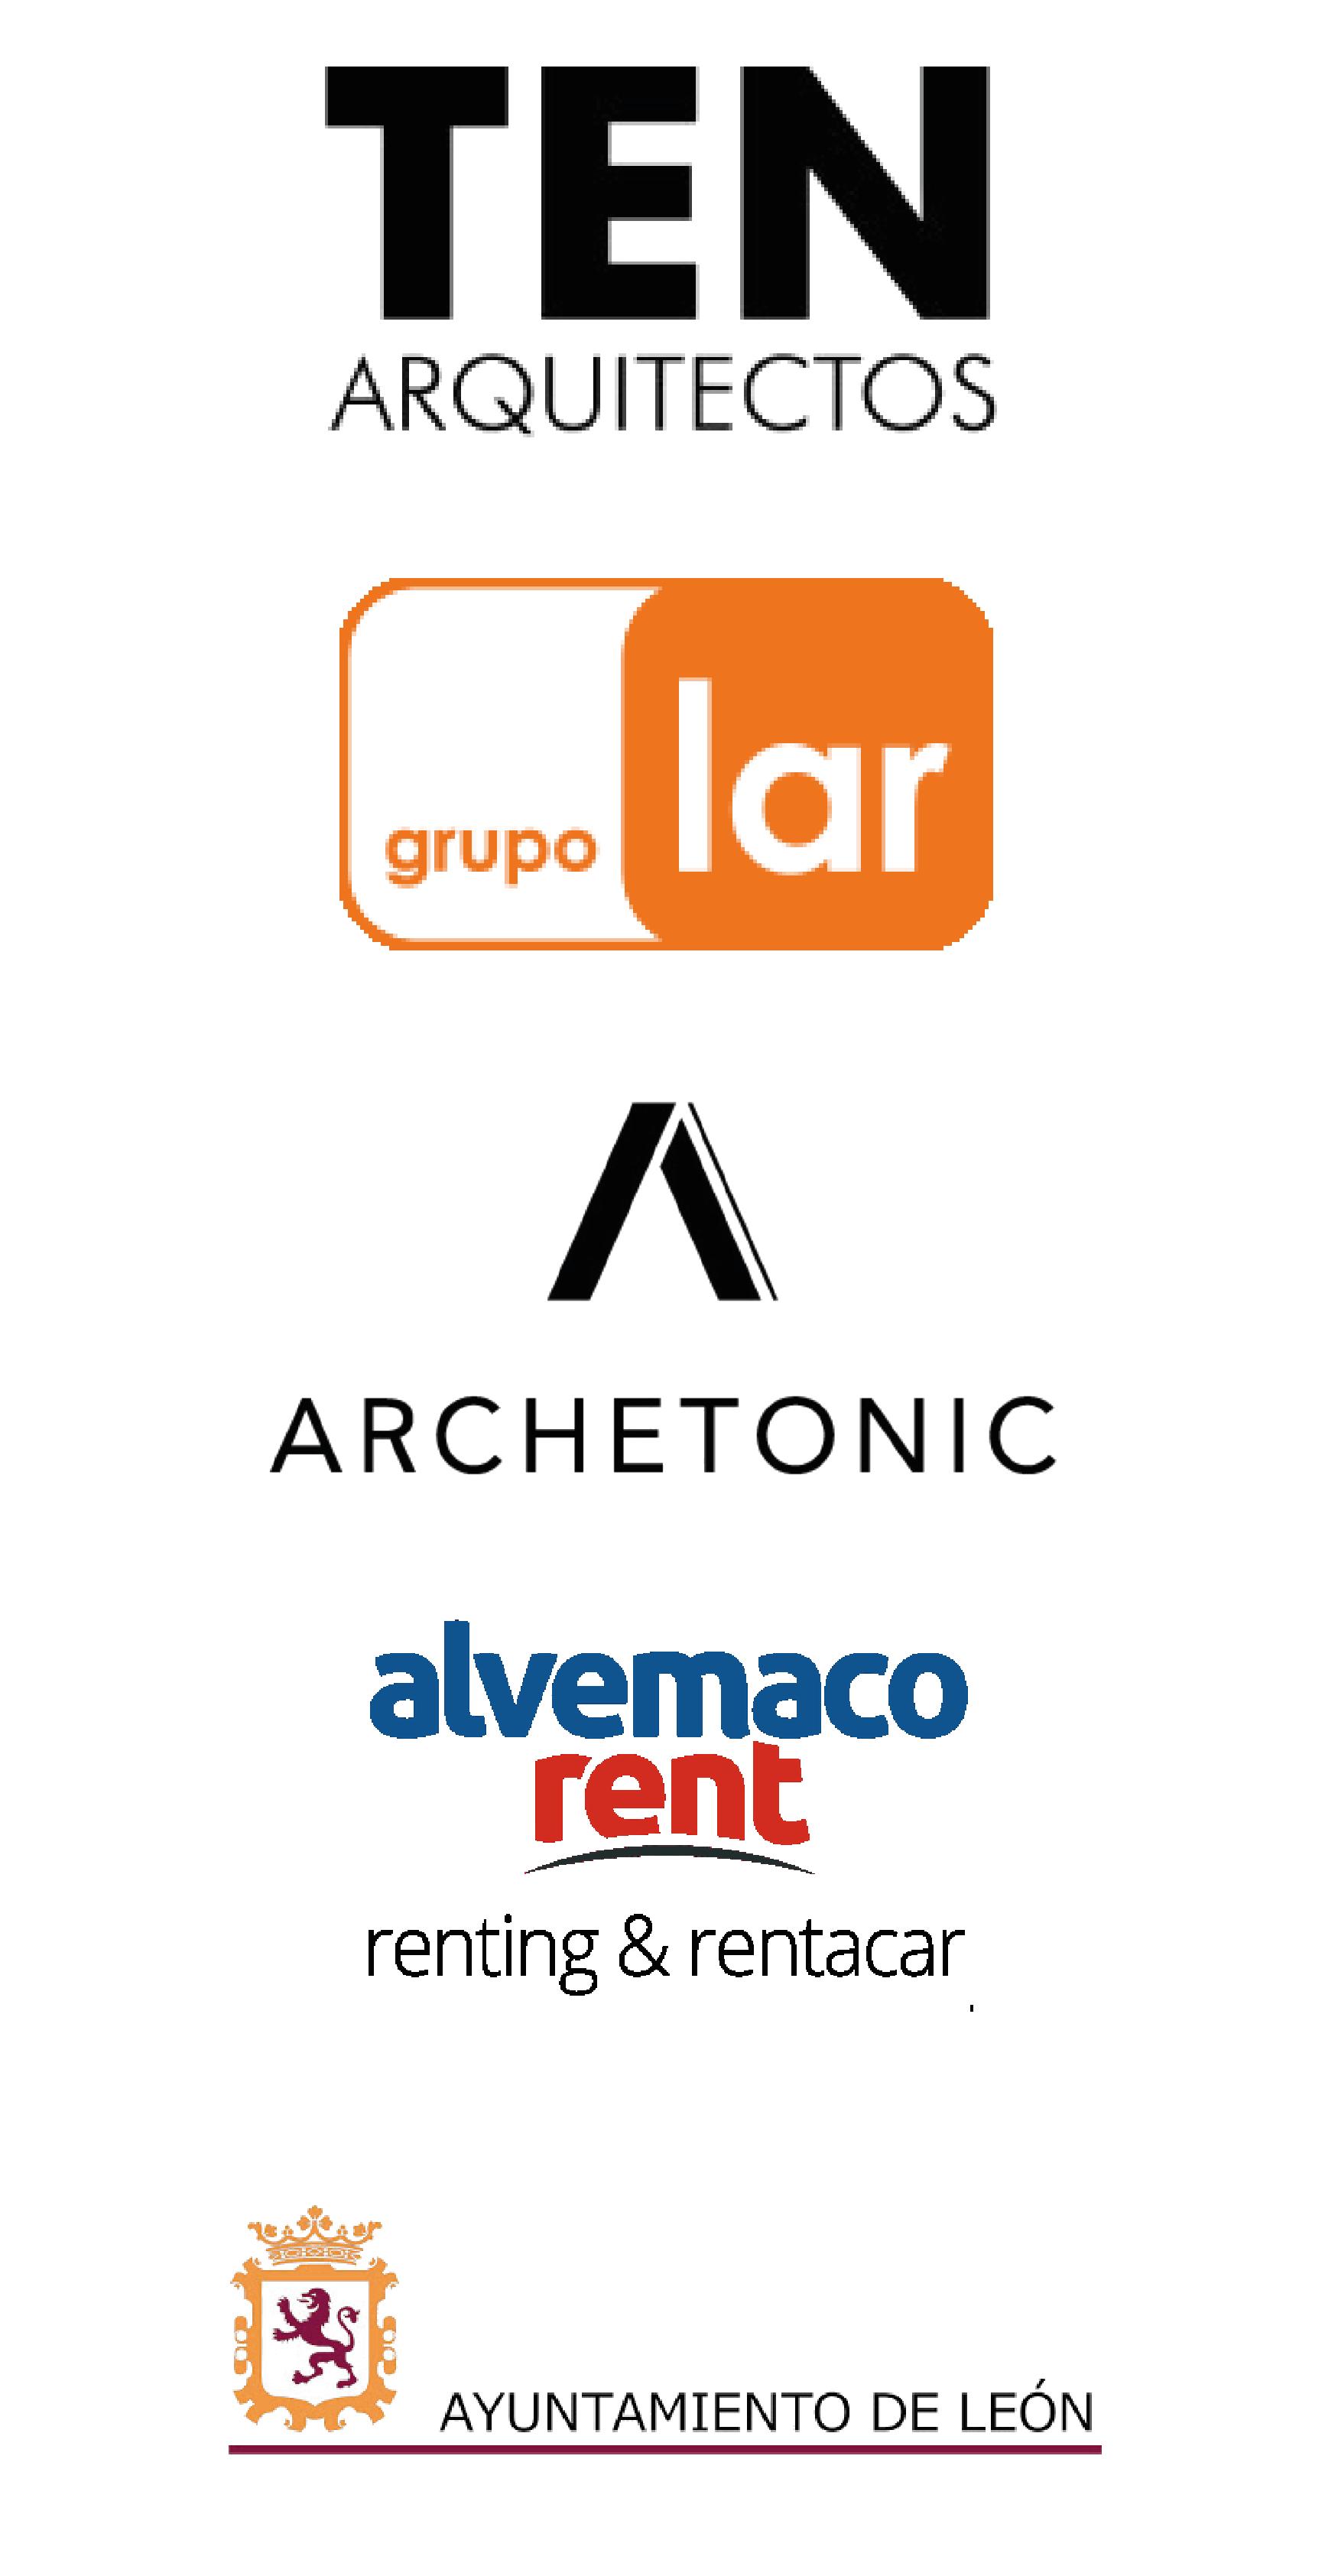 grupo_resnova_ten_grupolar_archetonic_alvemaco_ayuntamientodeleon